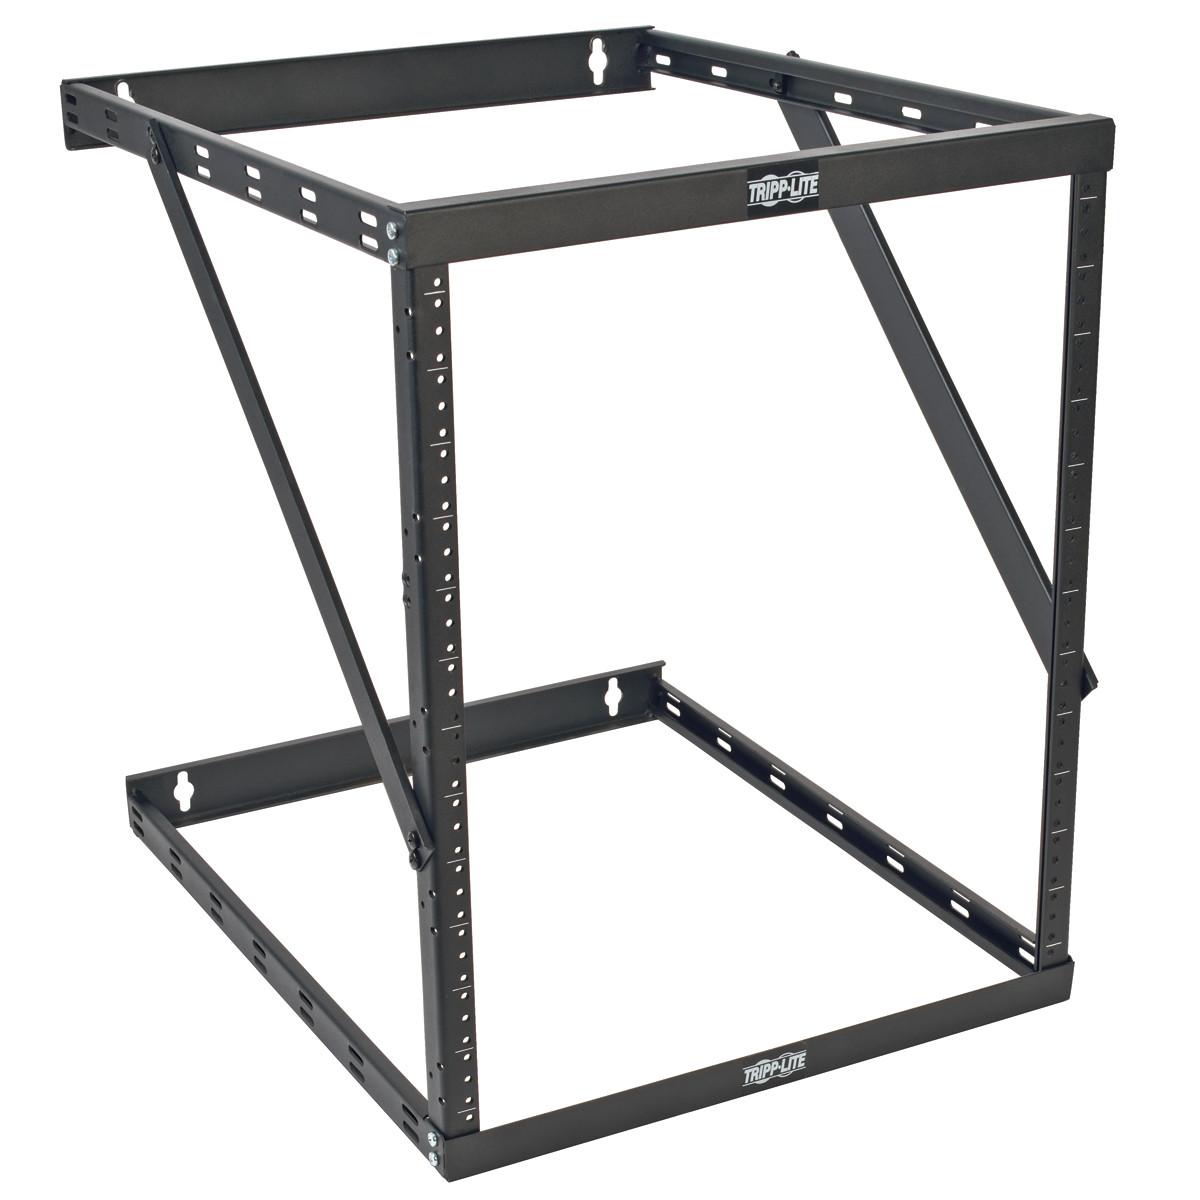 "Tripp Lite SmartRack 8U/12U/22U Expandable Low-Profile UPS-Depth Wall-Mount 2-Post Open-Frame Rack (Device depth 23.5"")"